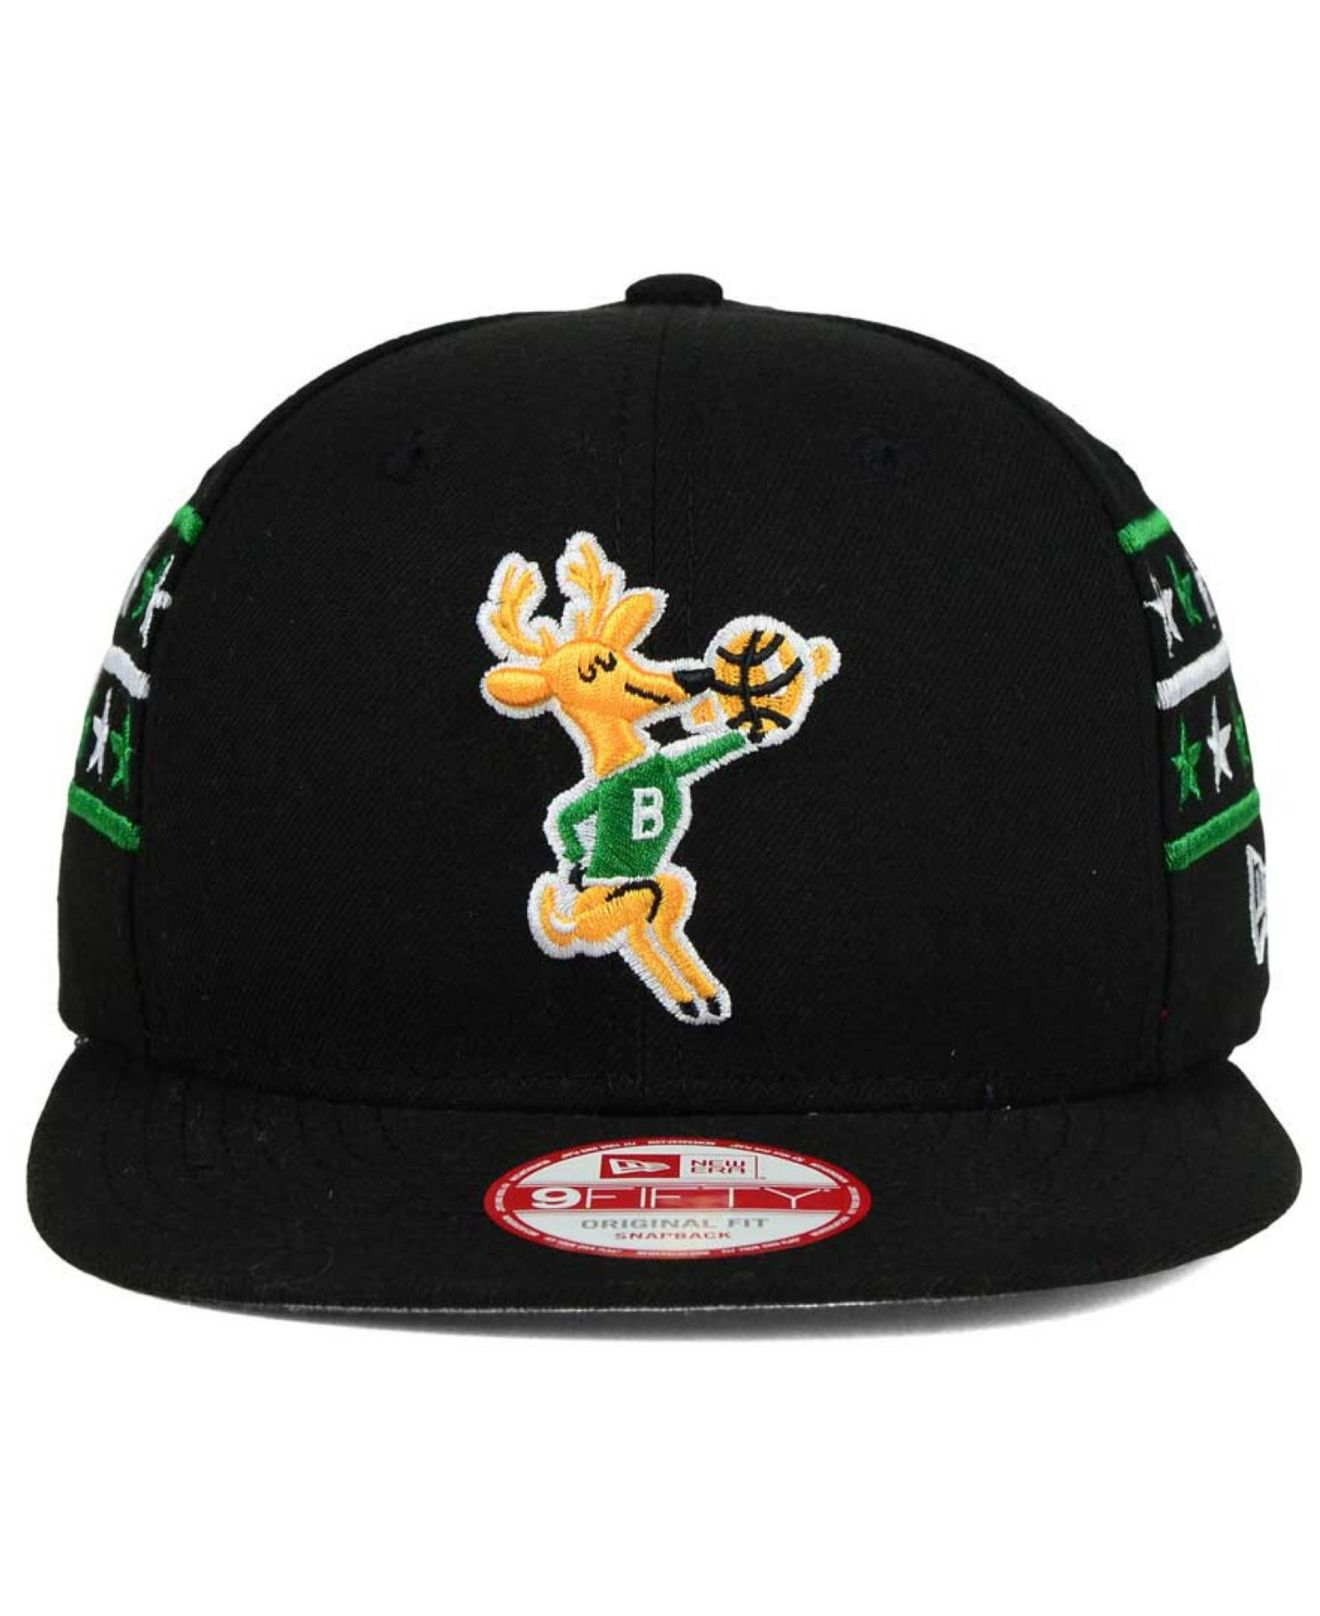 cheaper 3d8b6 6d57d Lyst - KTZ Milwaukee Bucks Fine Side 9fifty Snapback Cap in Black ...